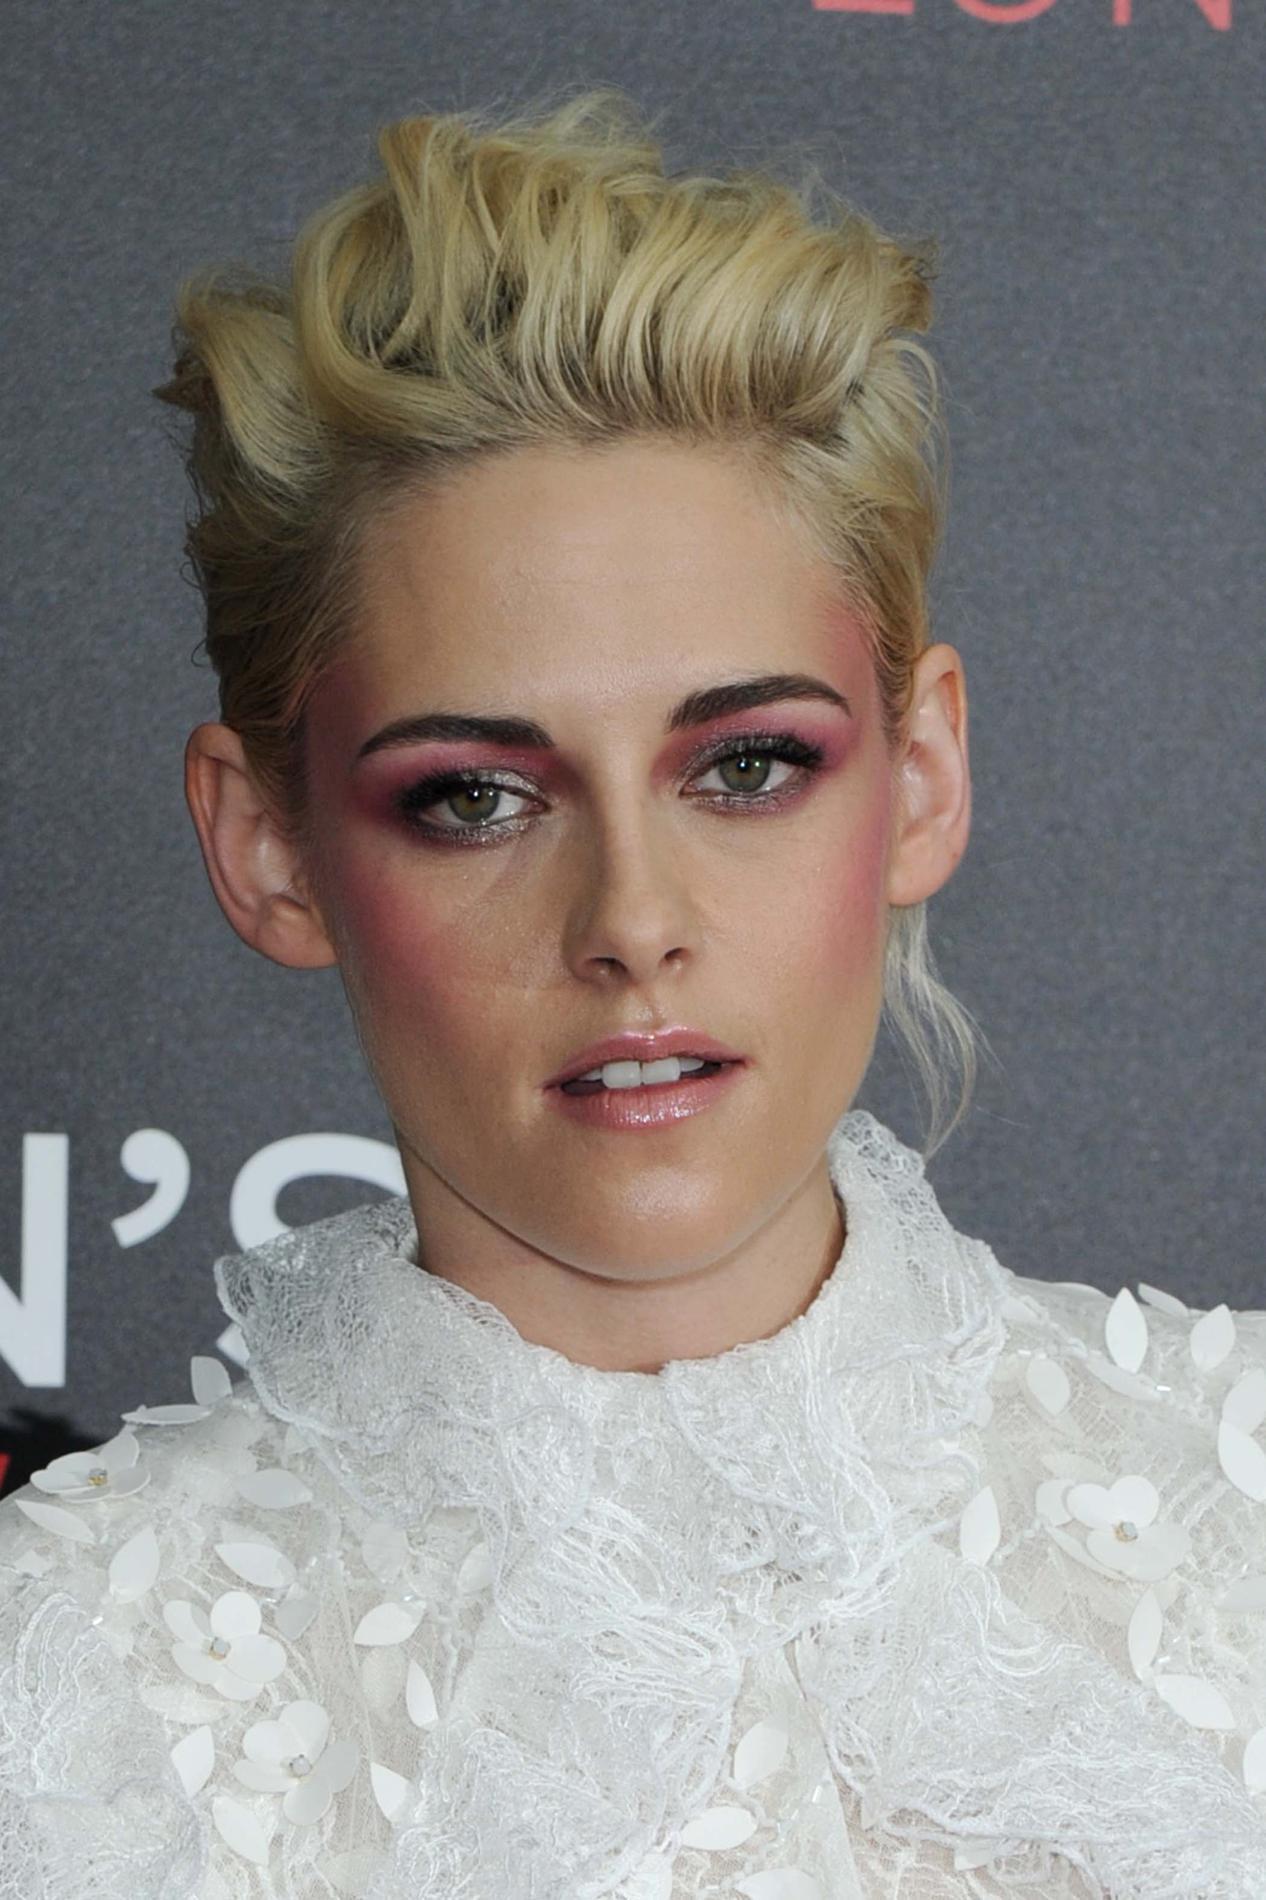 Kristen stewart l 39 volution coiffure d 39 une audacieuse madame figaro - Coupe garconne fille ...